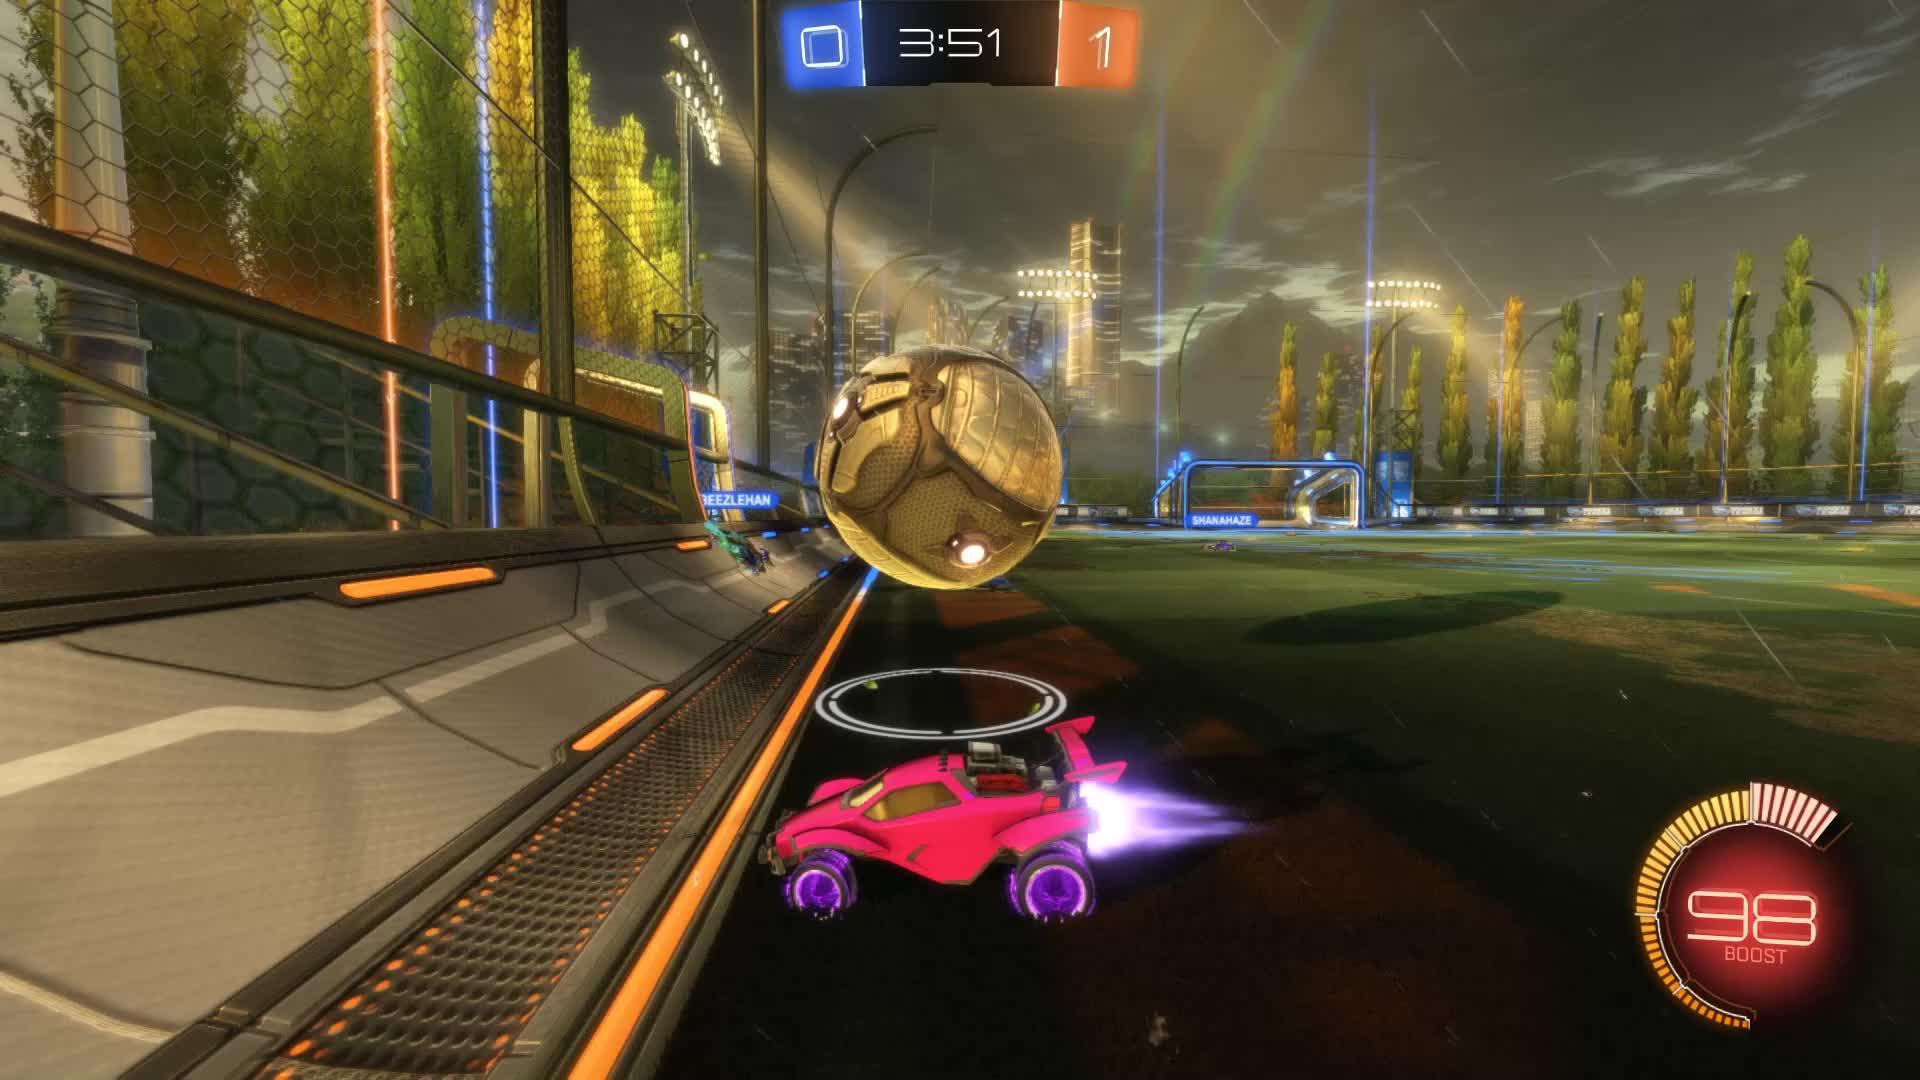 Gif Your Game, GifYourGame, Goal, JAG, Rocket League, RocketLeague, Goal 2: JAG GIFs